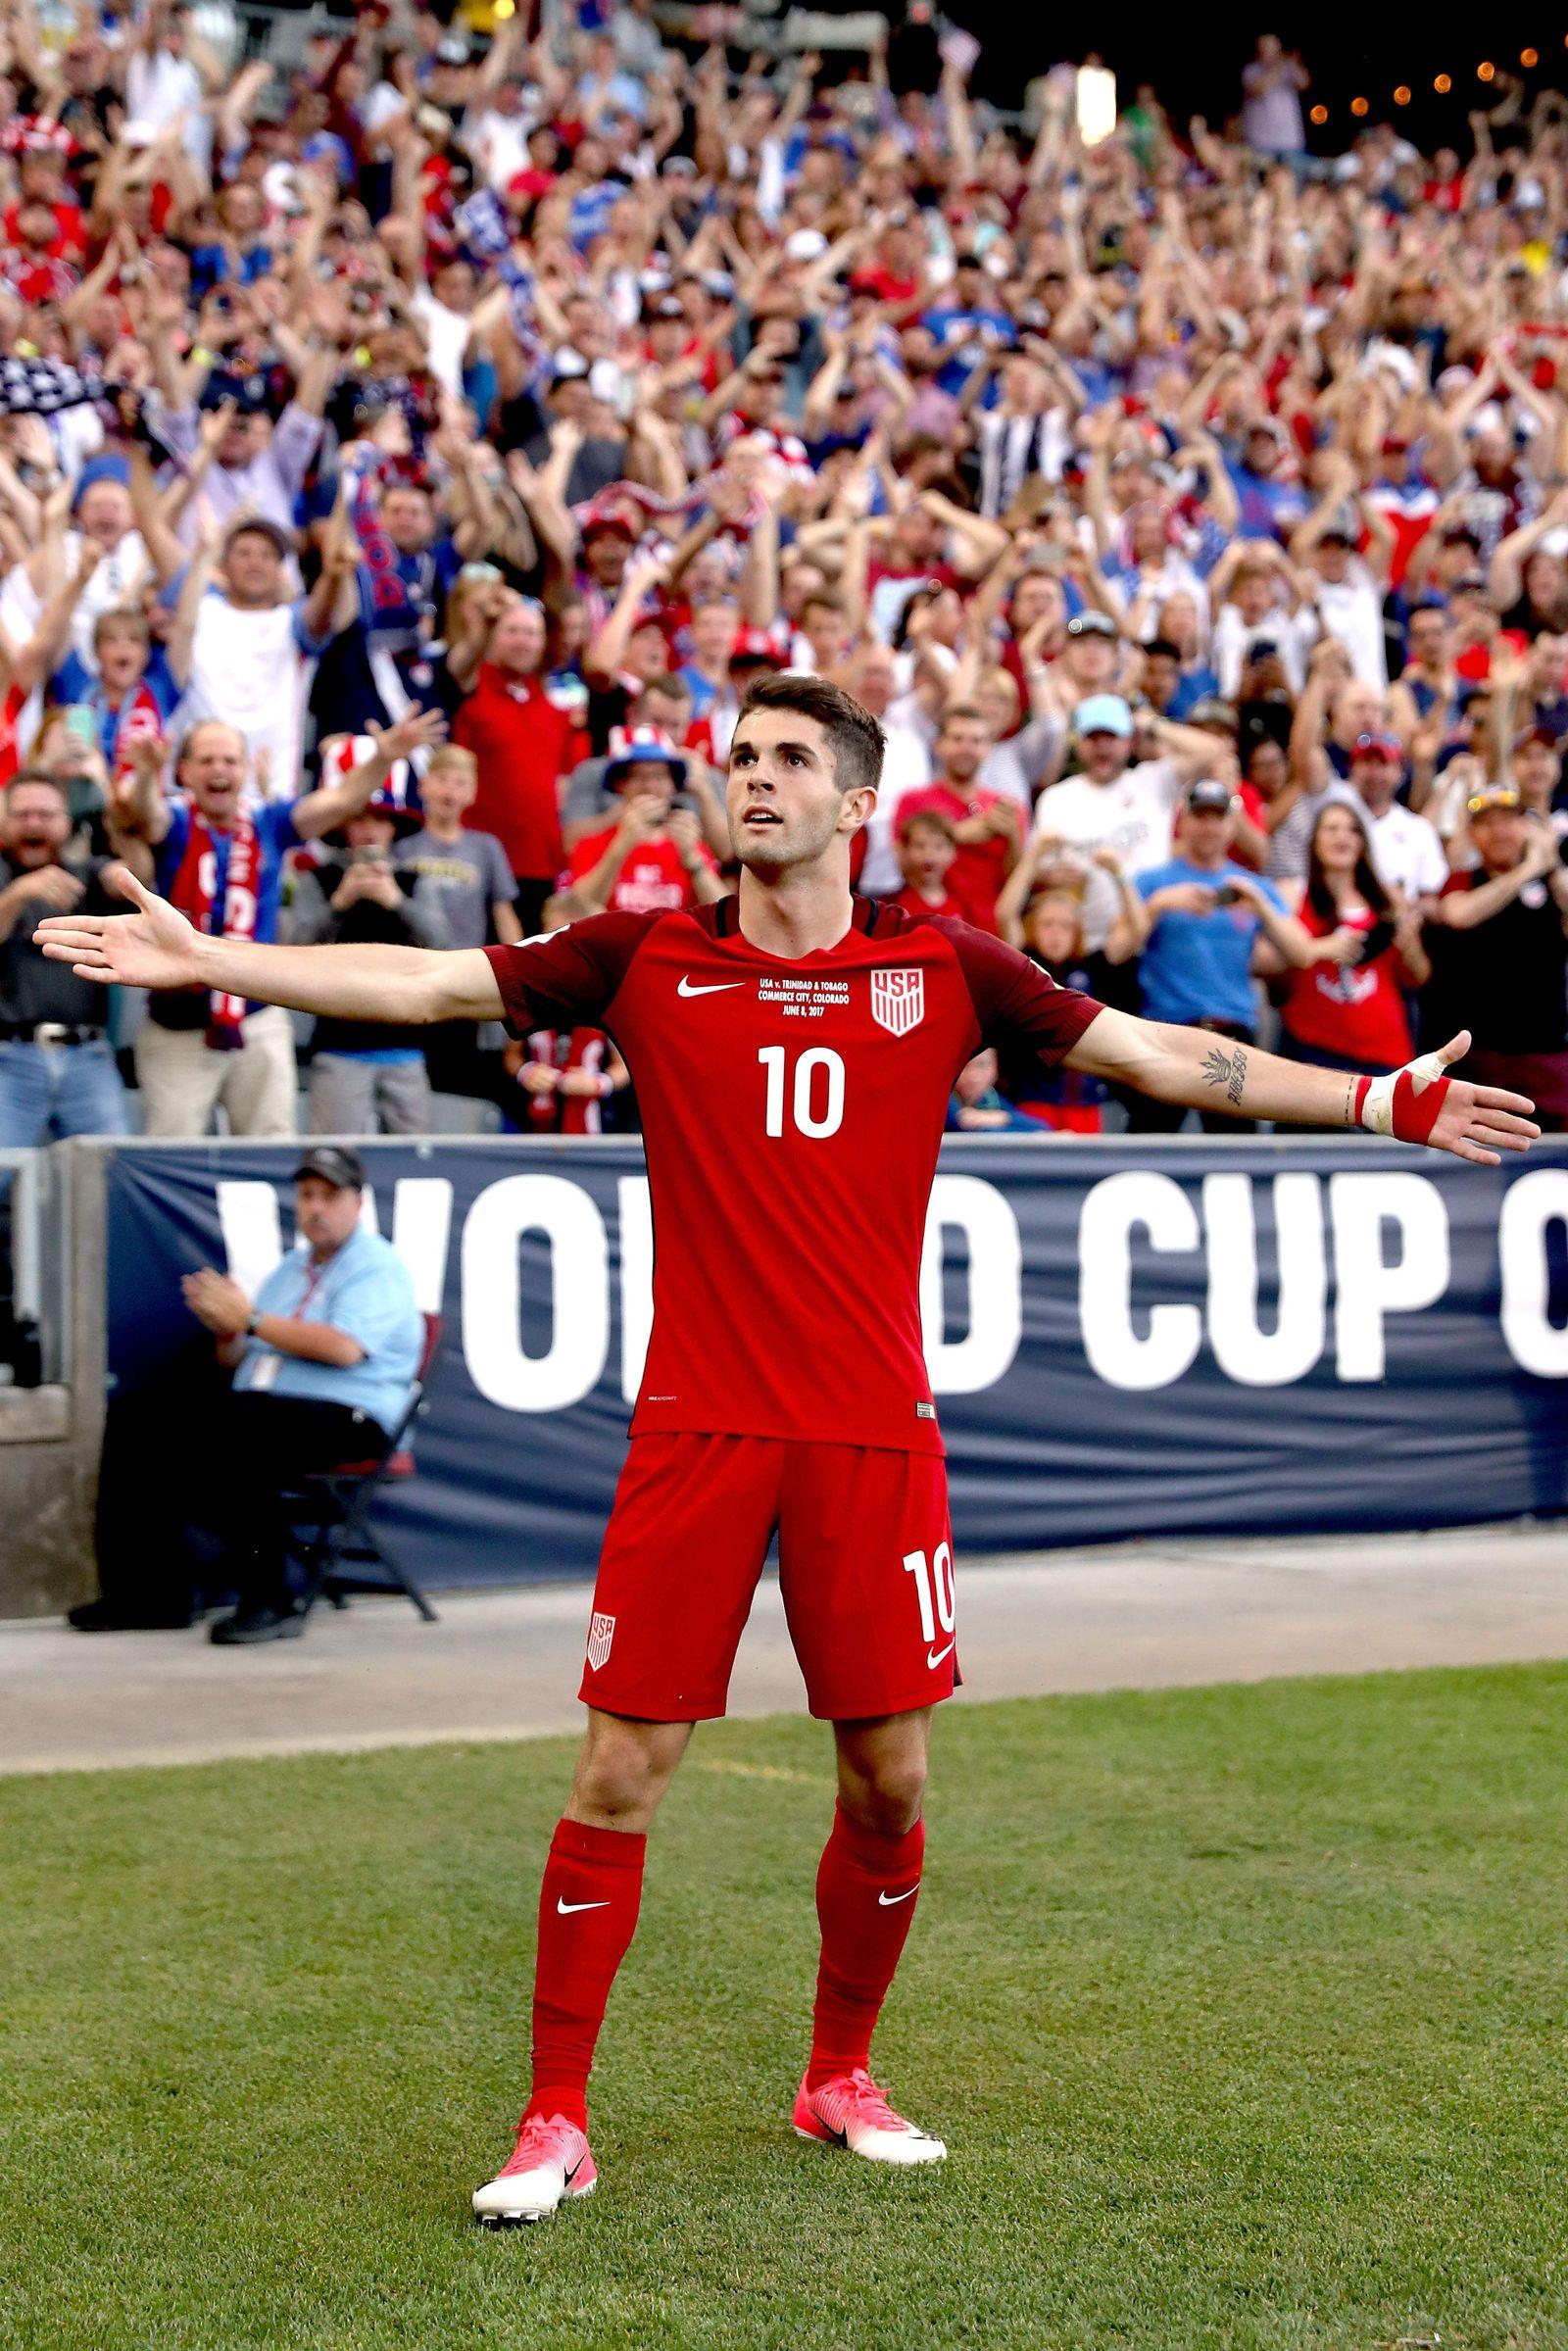 SOC-FOI-WCS-SPO-TRINIDAD-&-TOBAGO-V-UNITED-STATES-FIFA-2018-WO